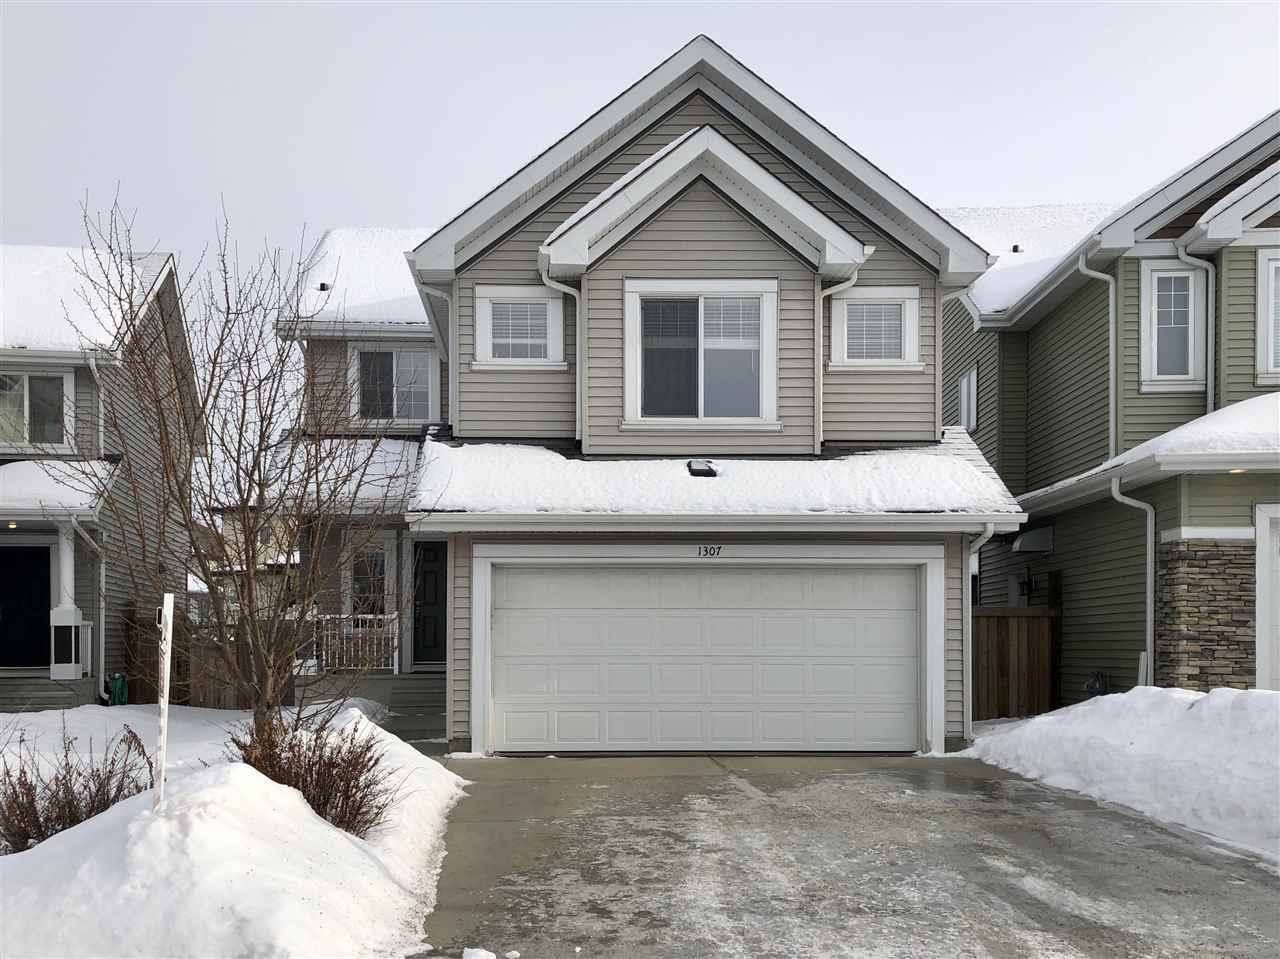 House for sale at 1307 72 St Sw Edmonton Alberta - MLS: E4183891